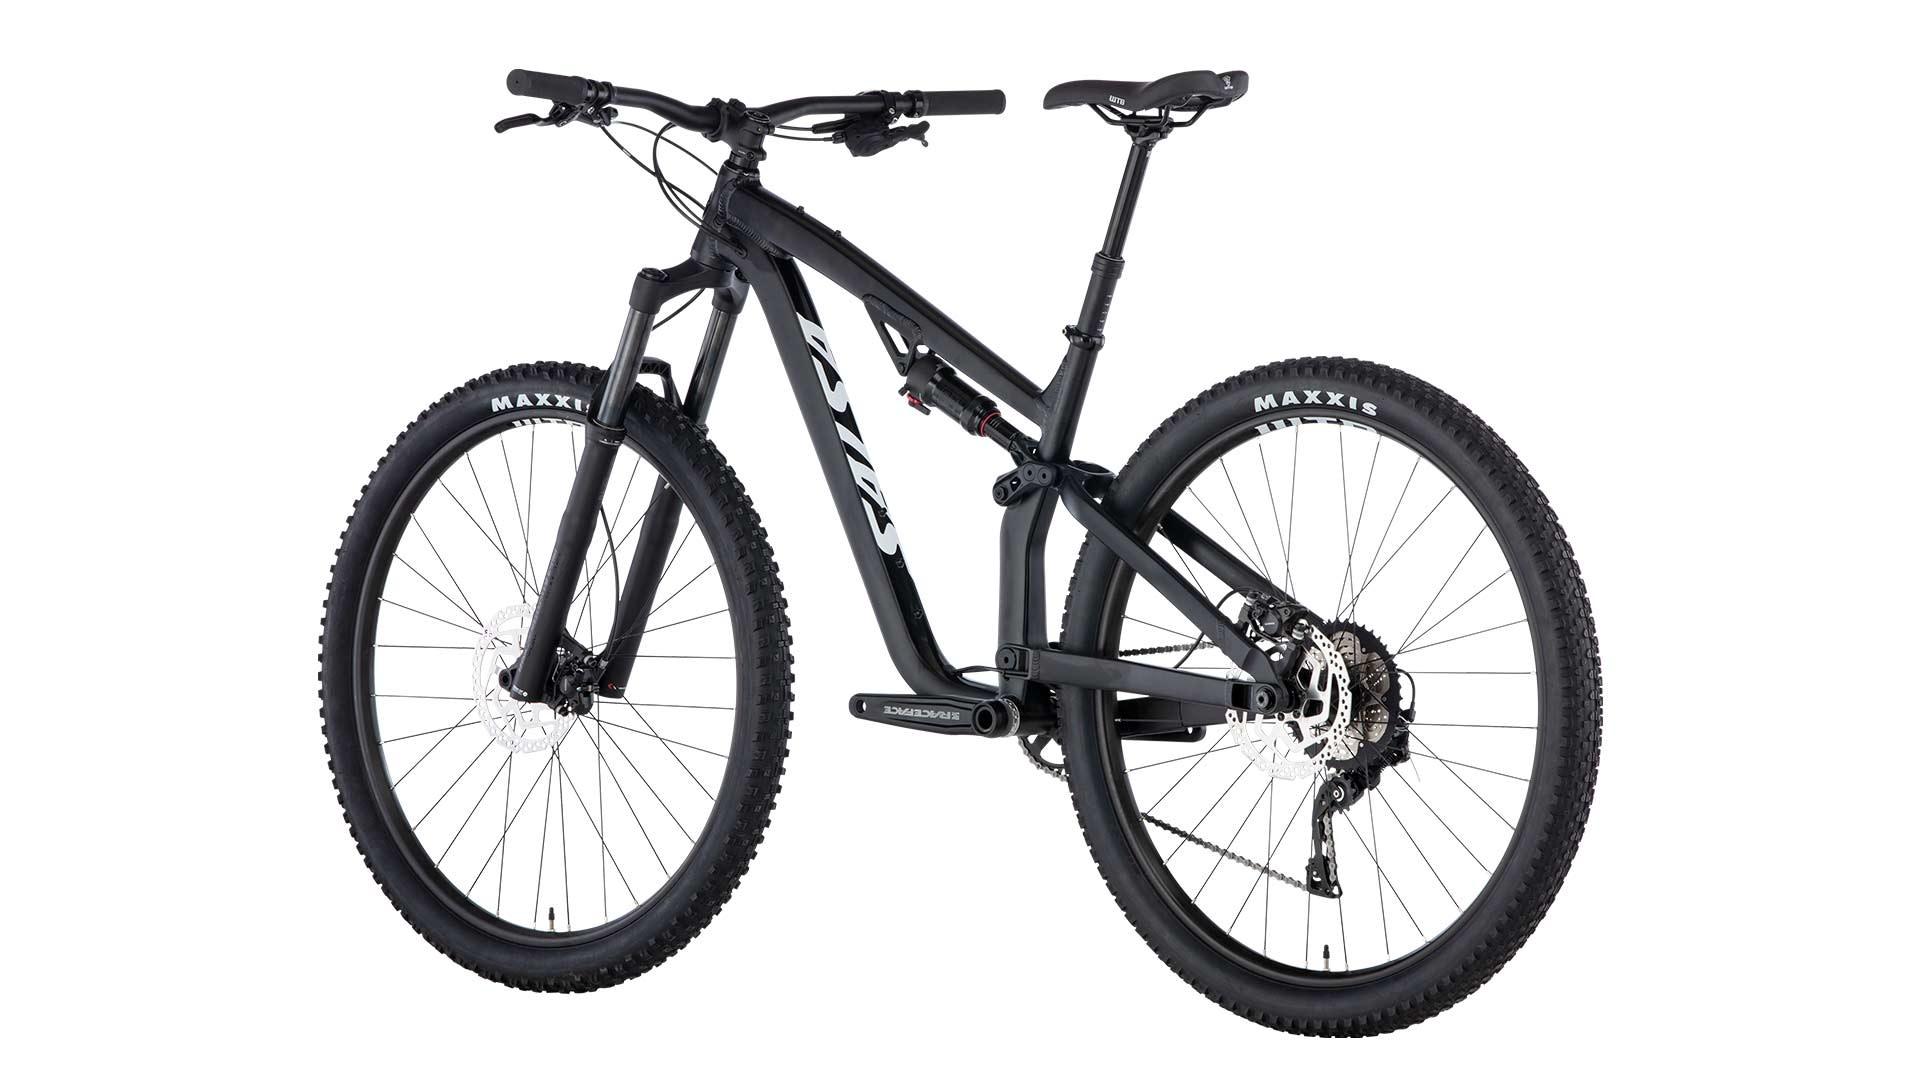 Salsa Salsa Spearfish Deore Bike Black 2019